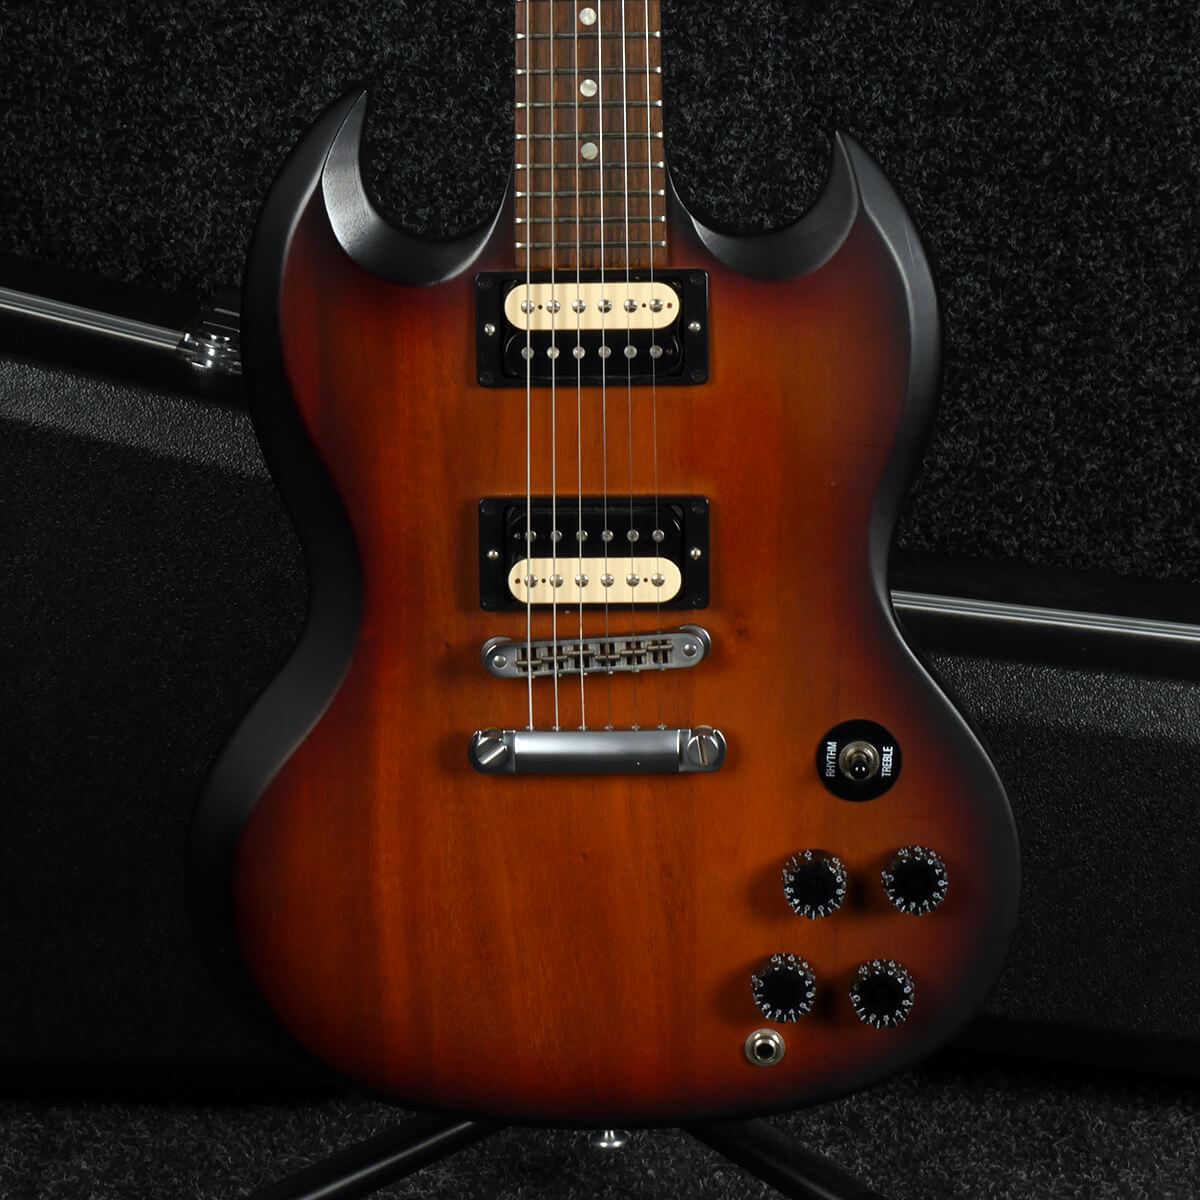 Gibson 2014 SG Special 120th Aniversary - Sunburst w/Hard Case - 2nd Hand